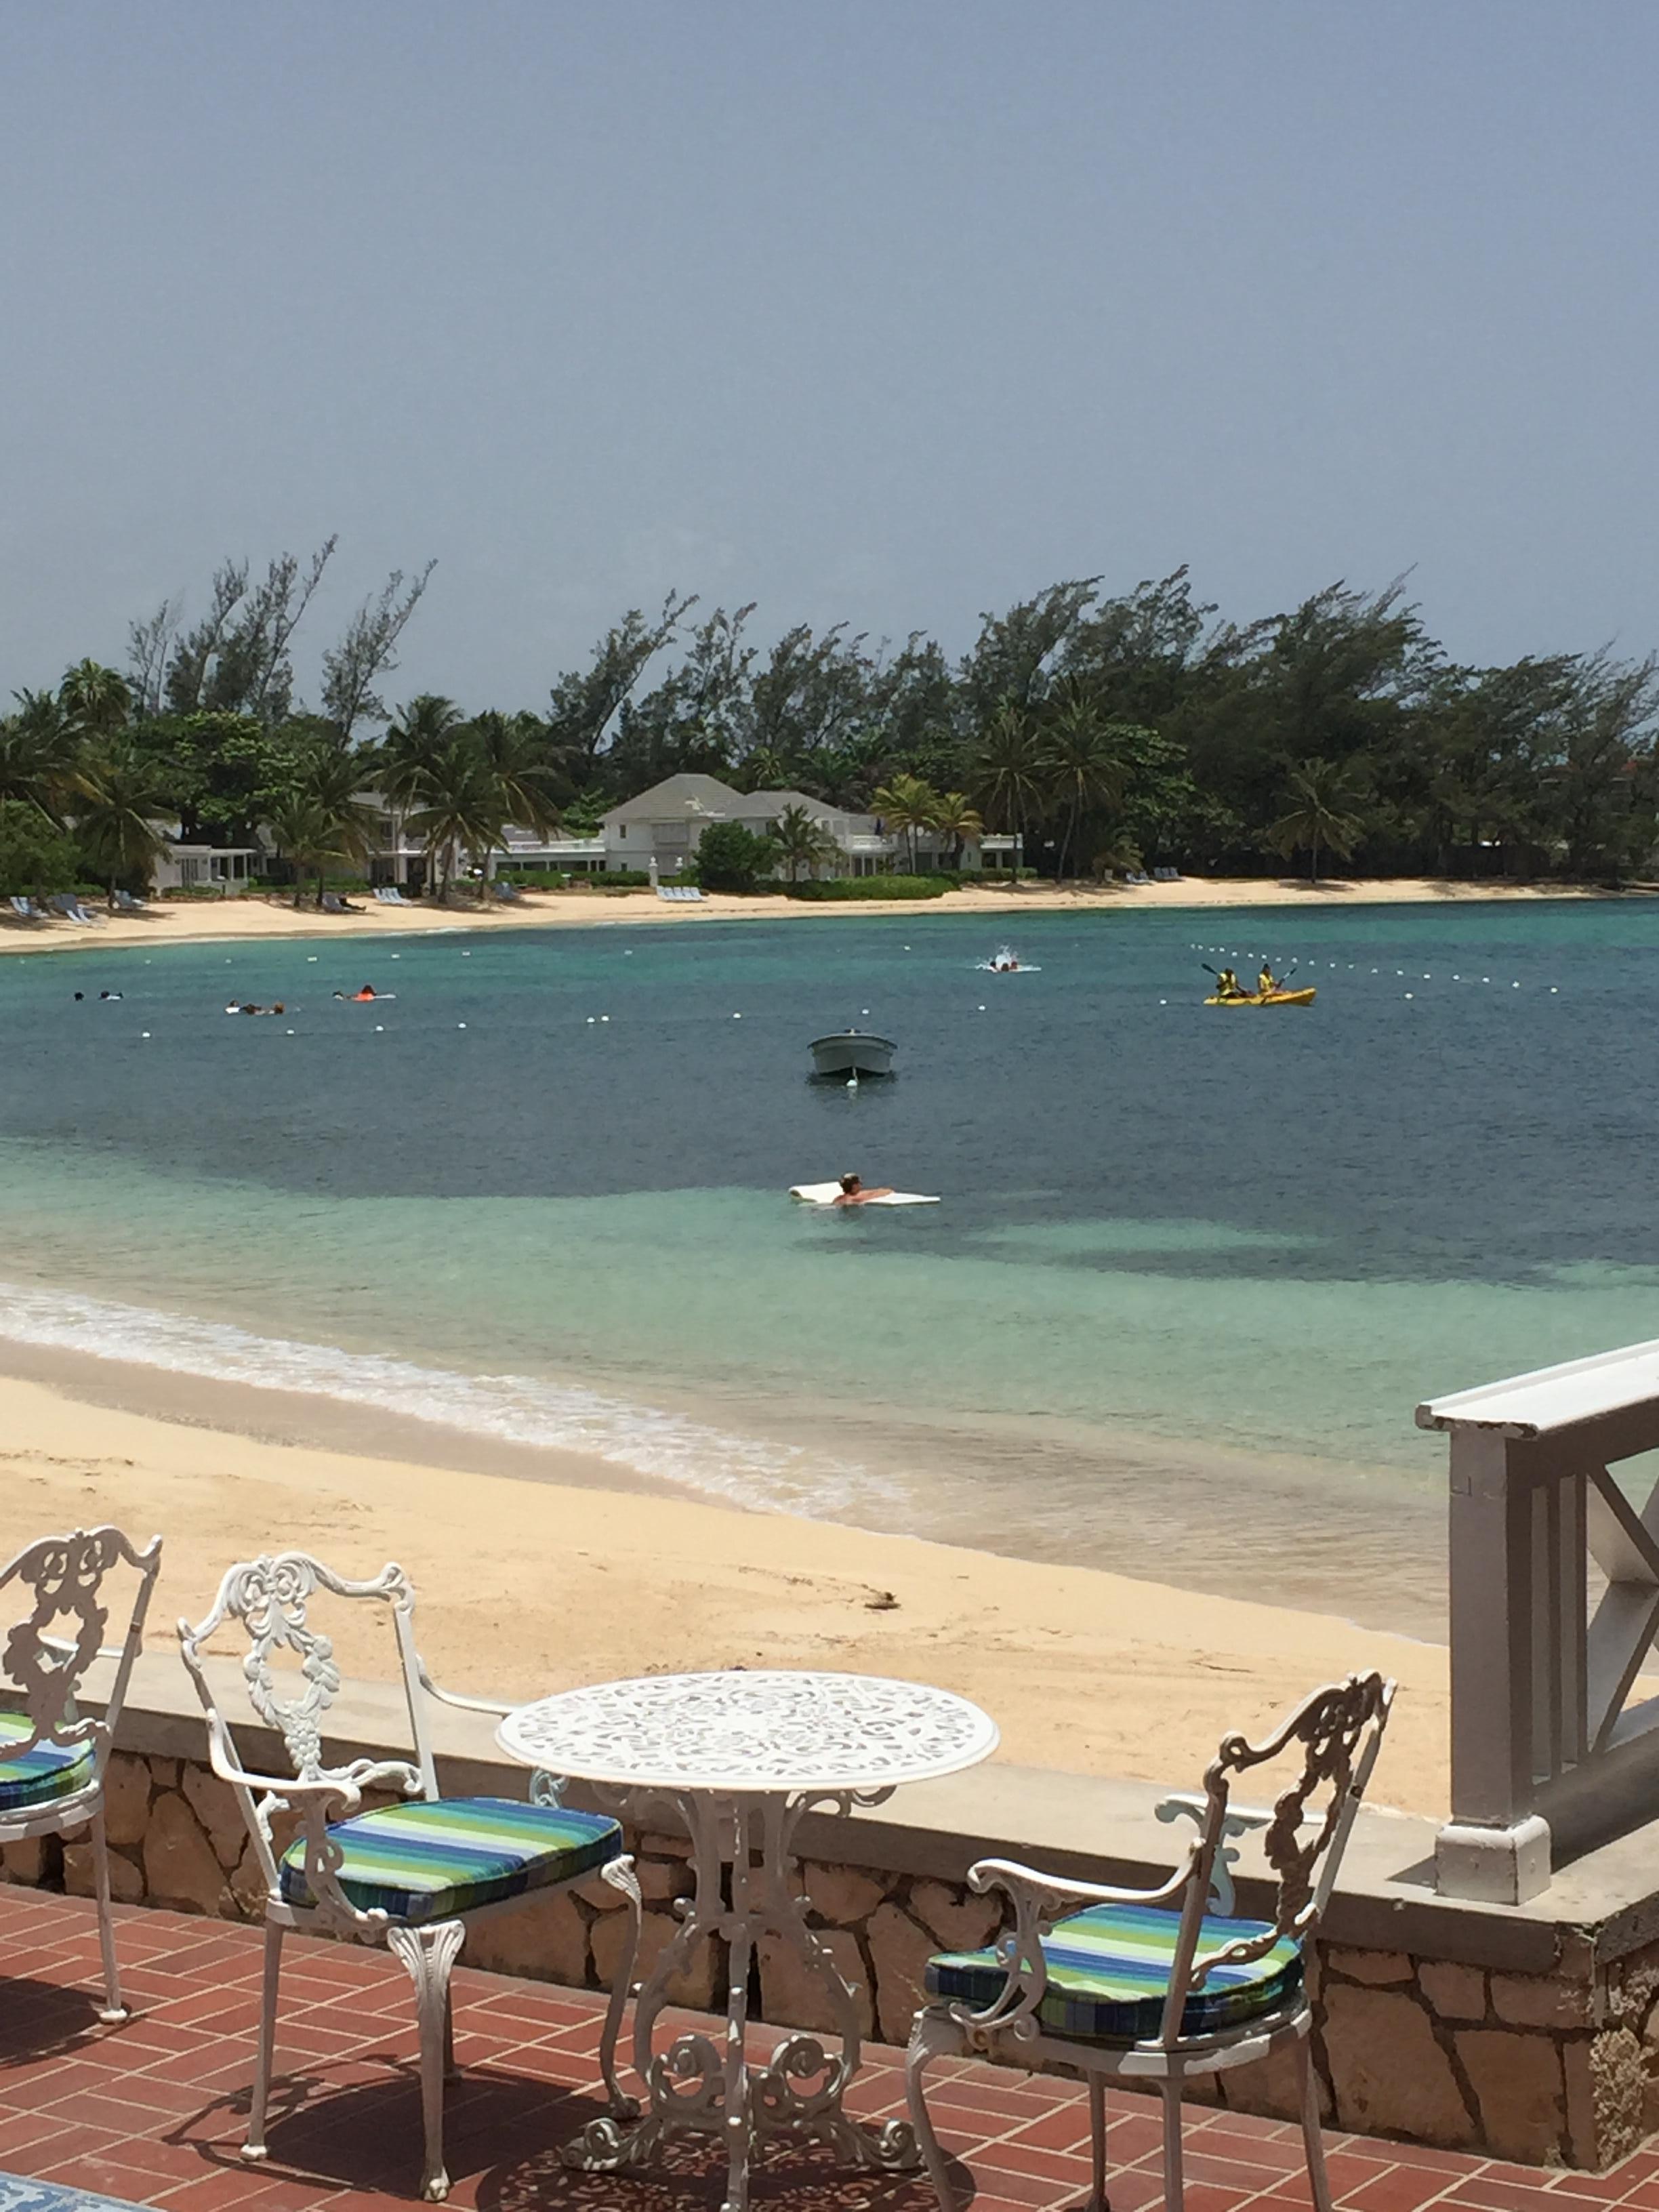 Very private beach area